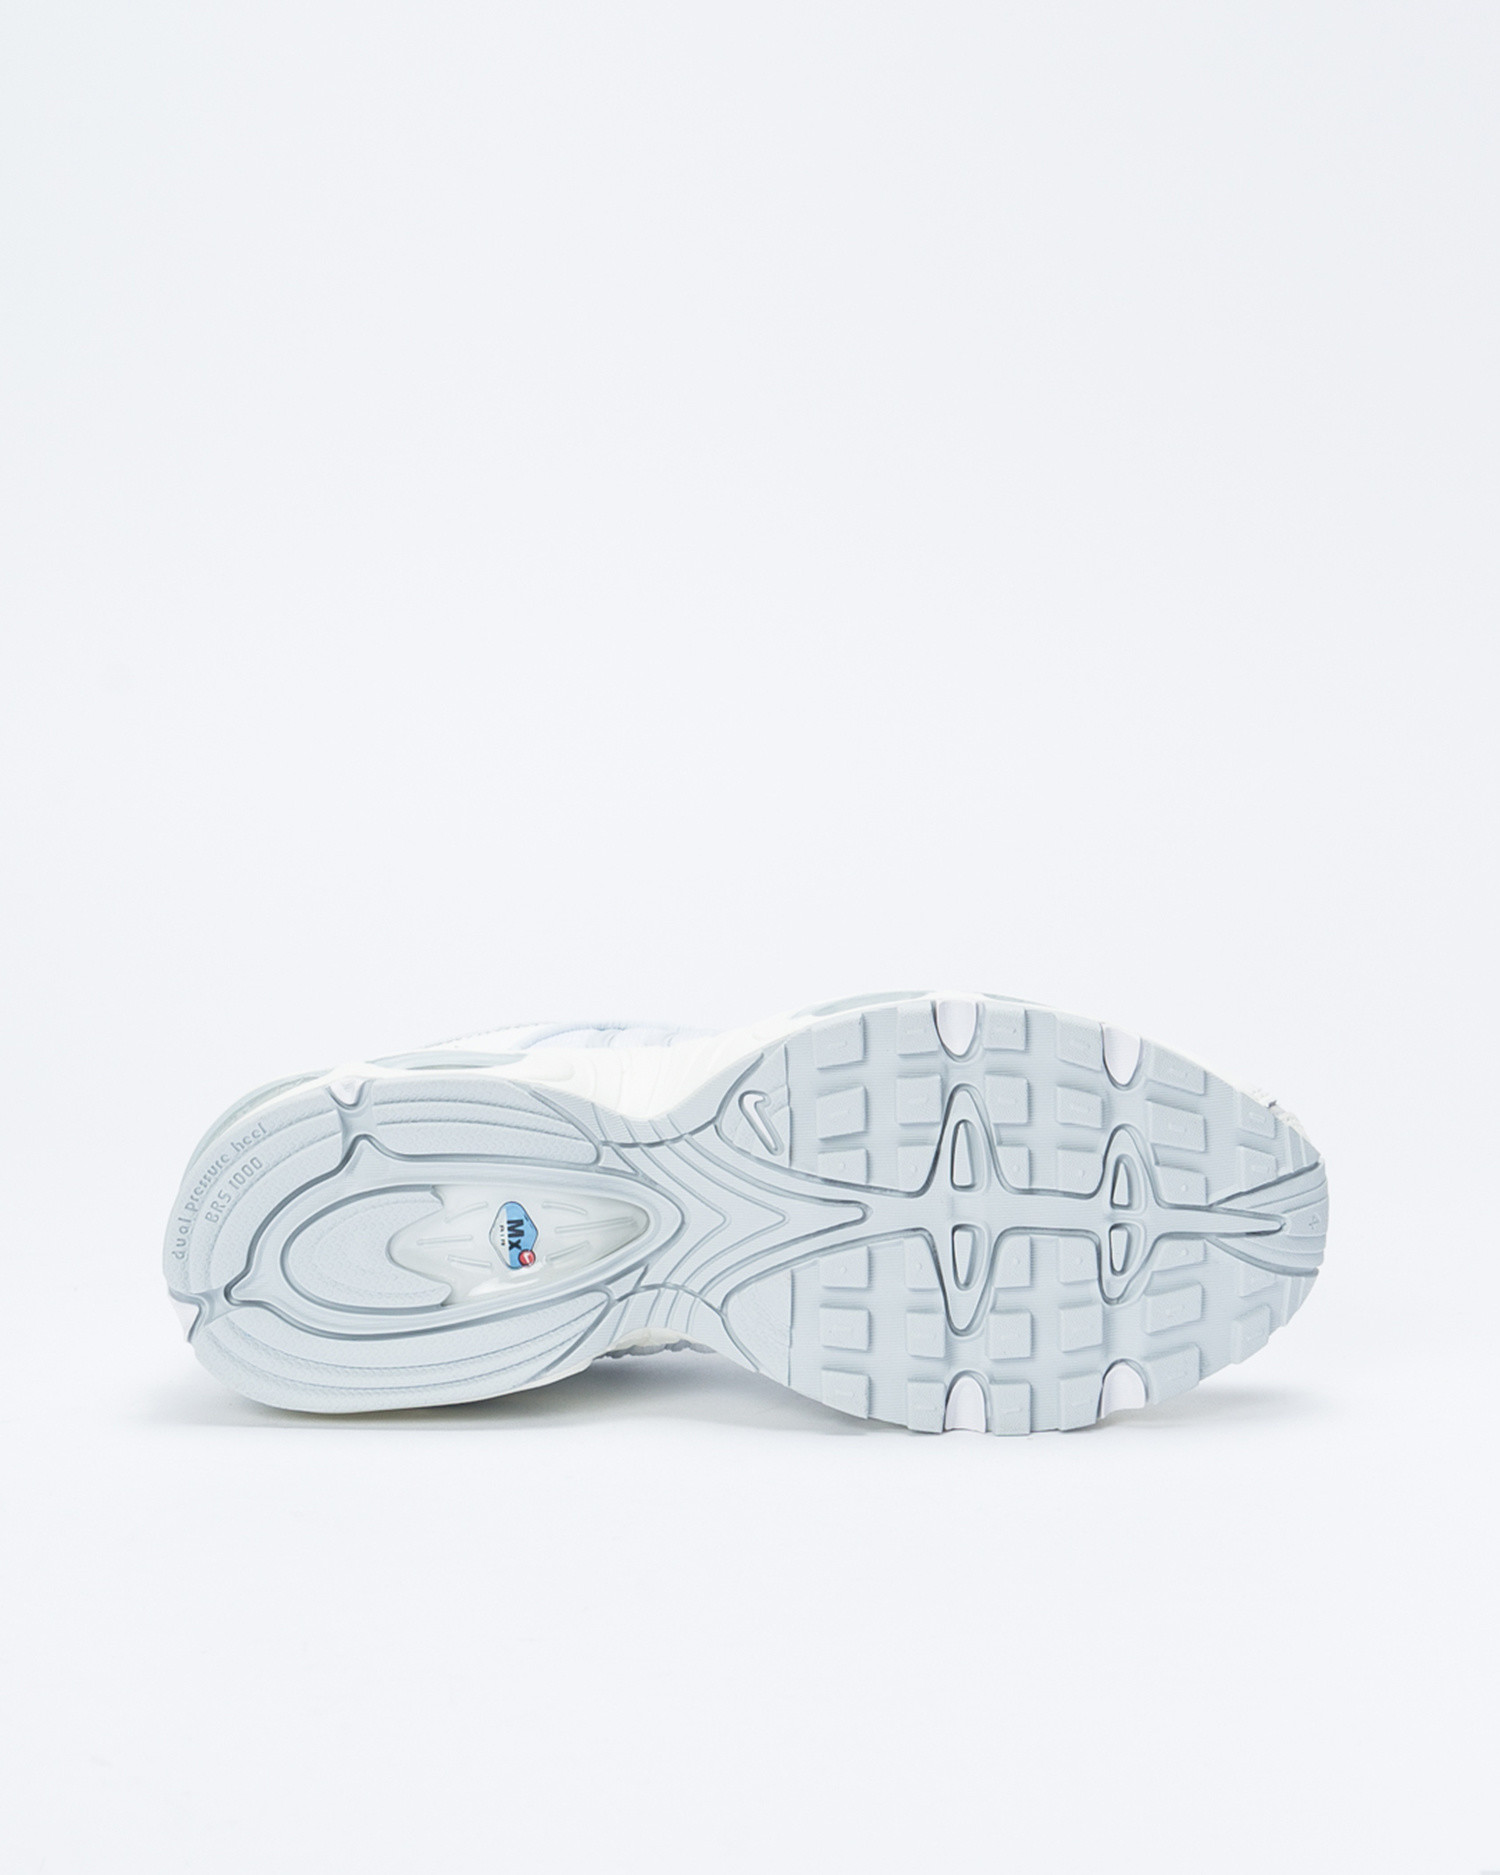 Nike Air Max Tailwind IV White/White/Sail/Pure Platinum